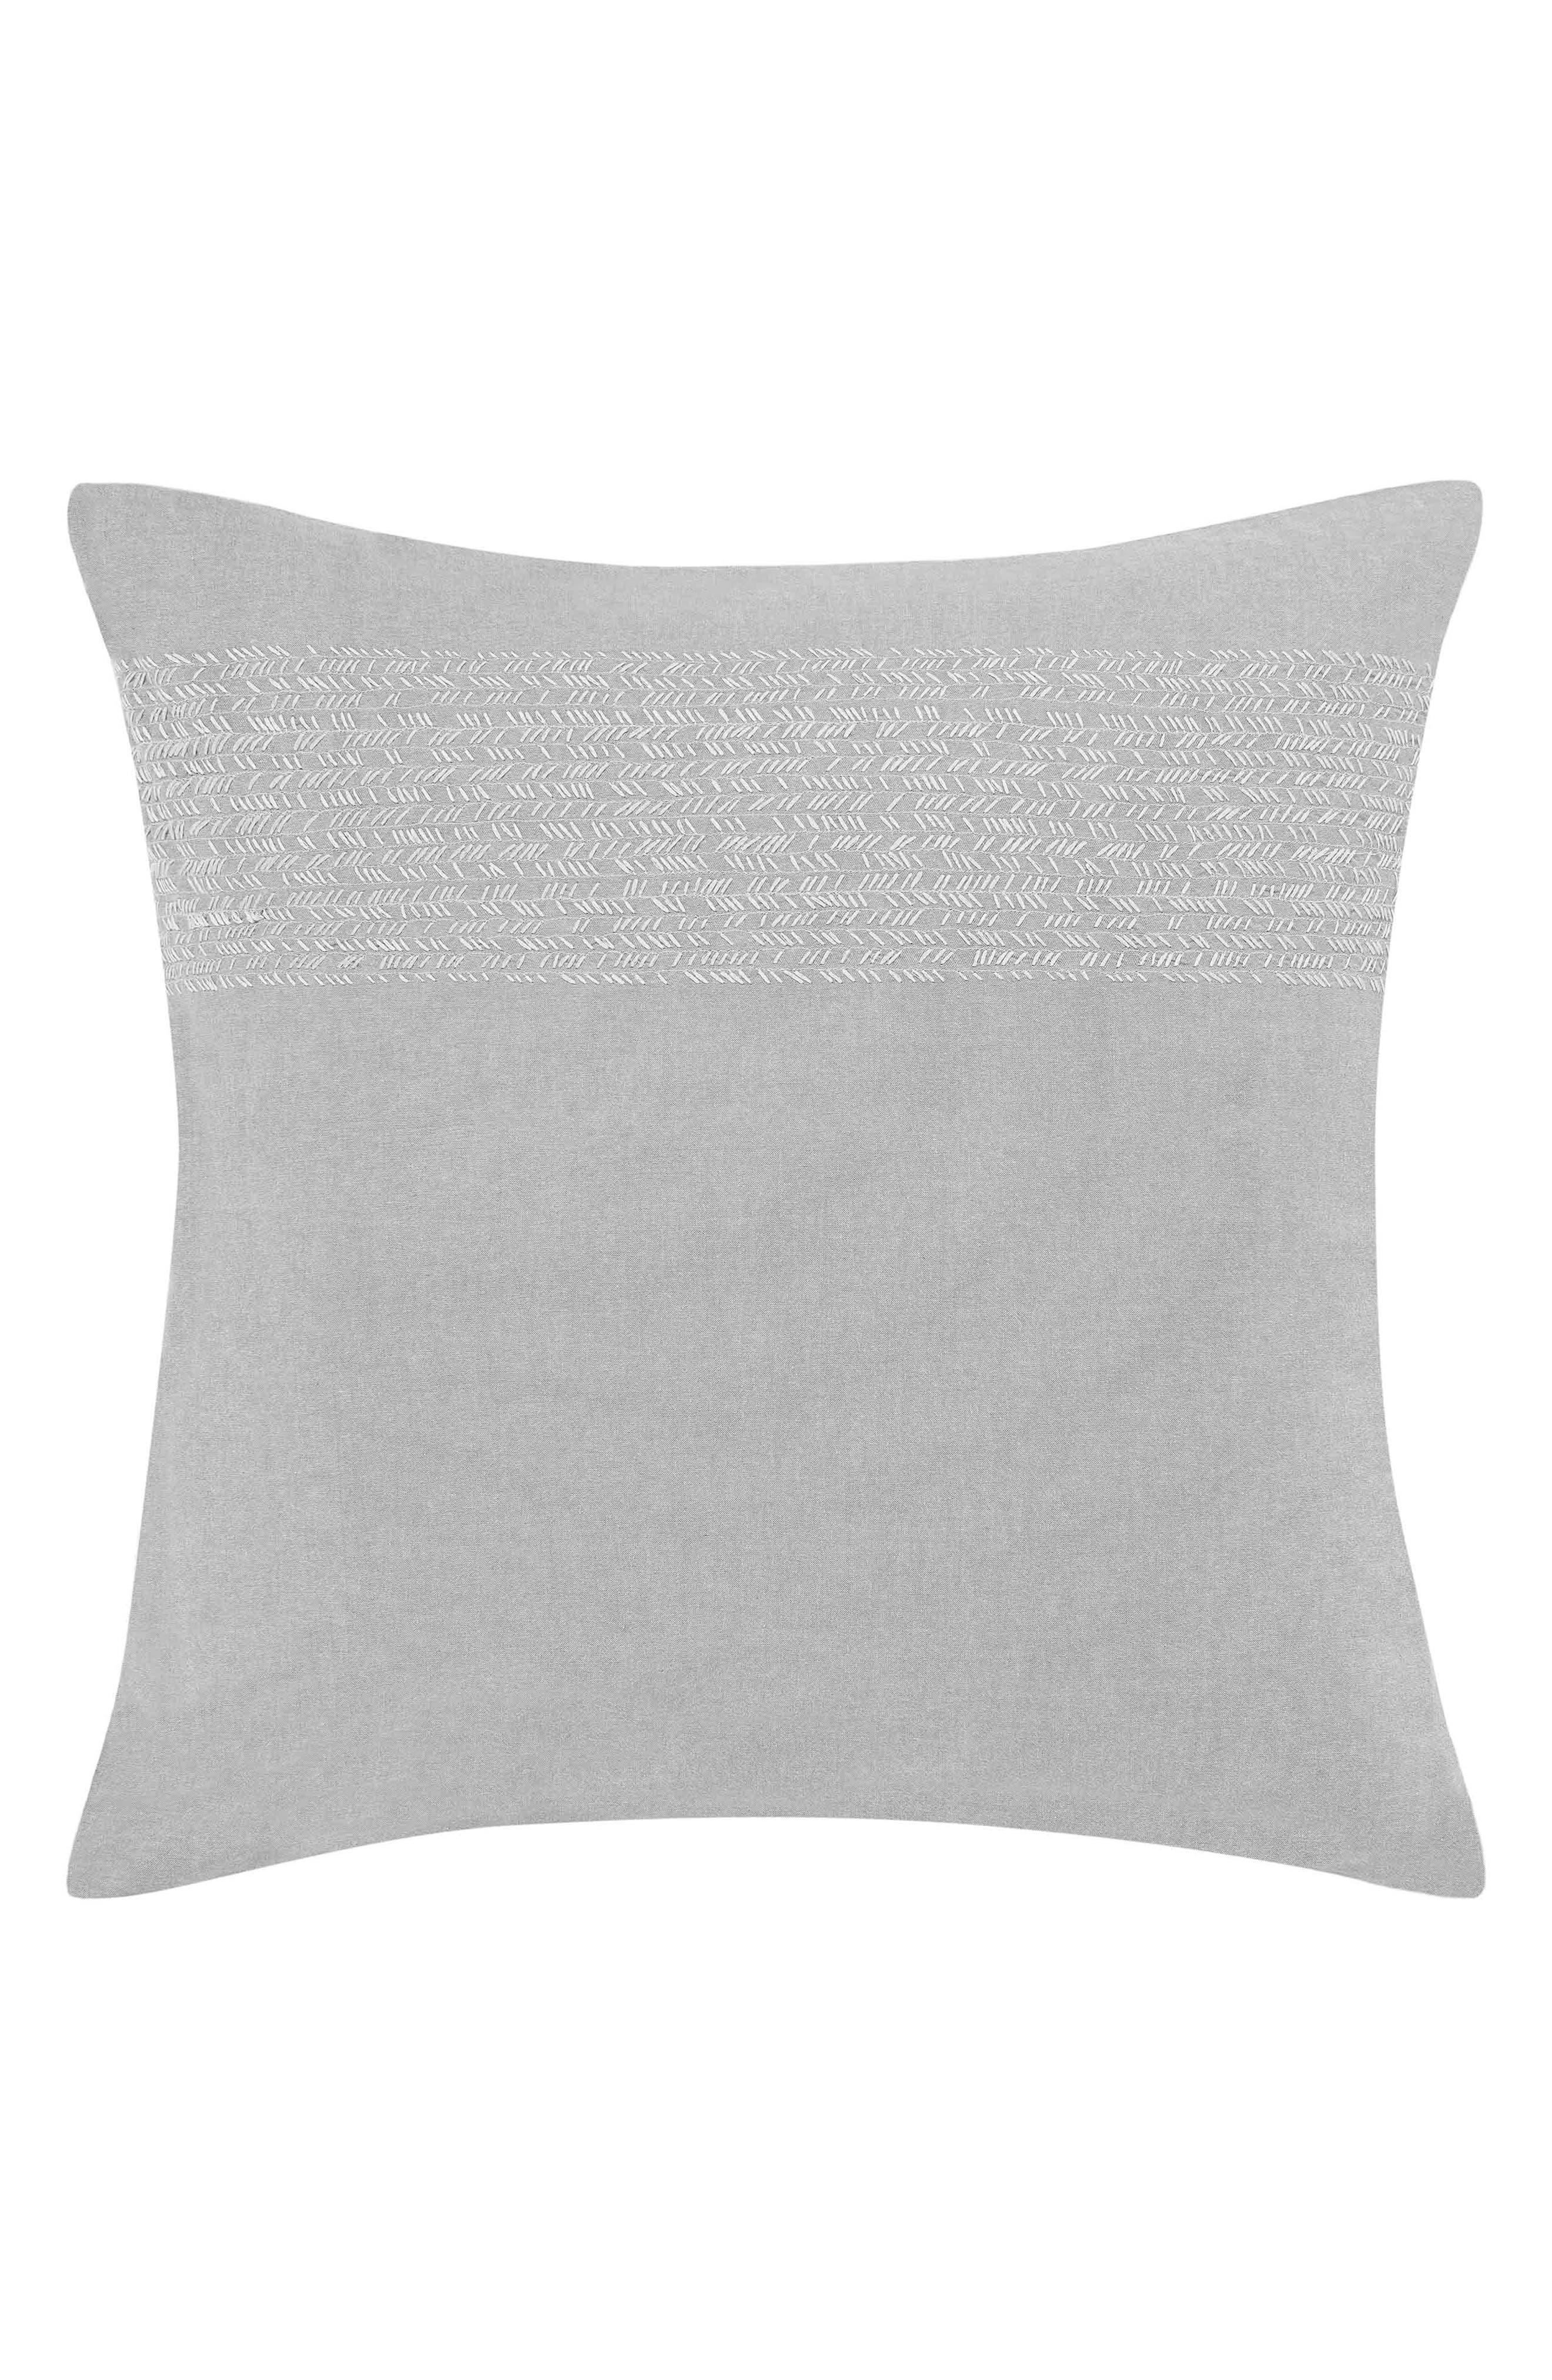 Claremont Euro Sham,                         Main,                         color, Pastel Grey